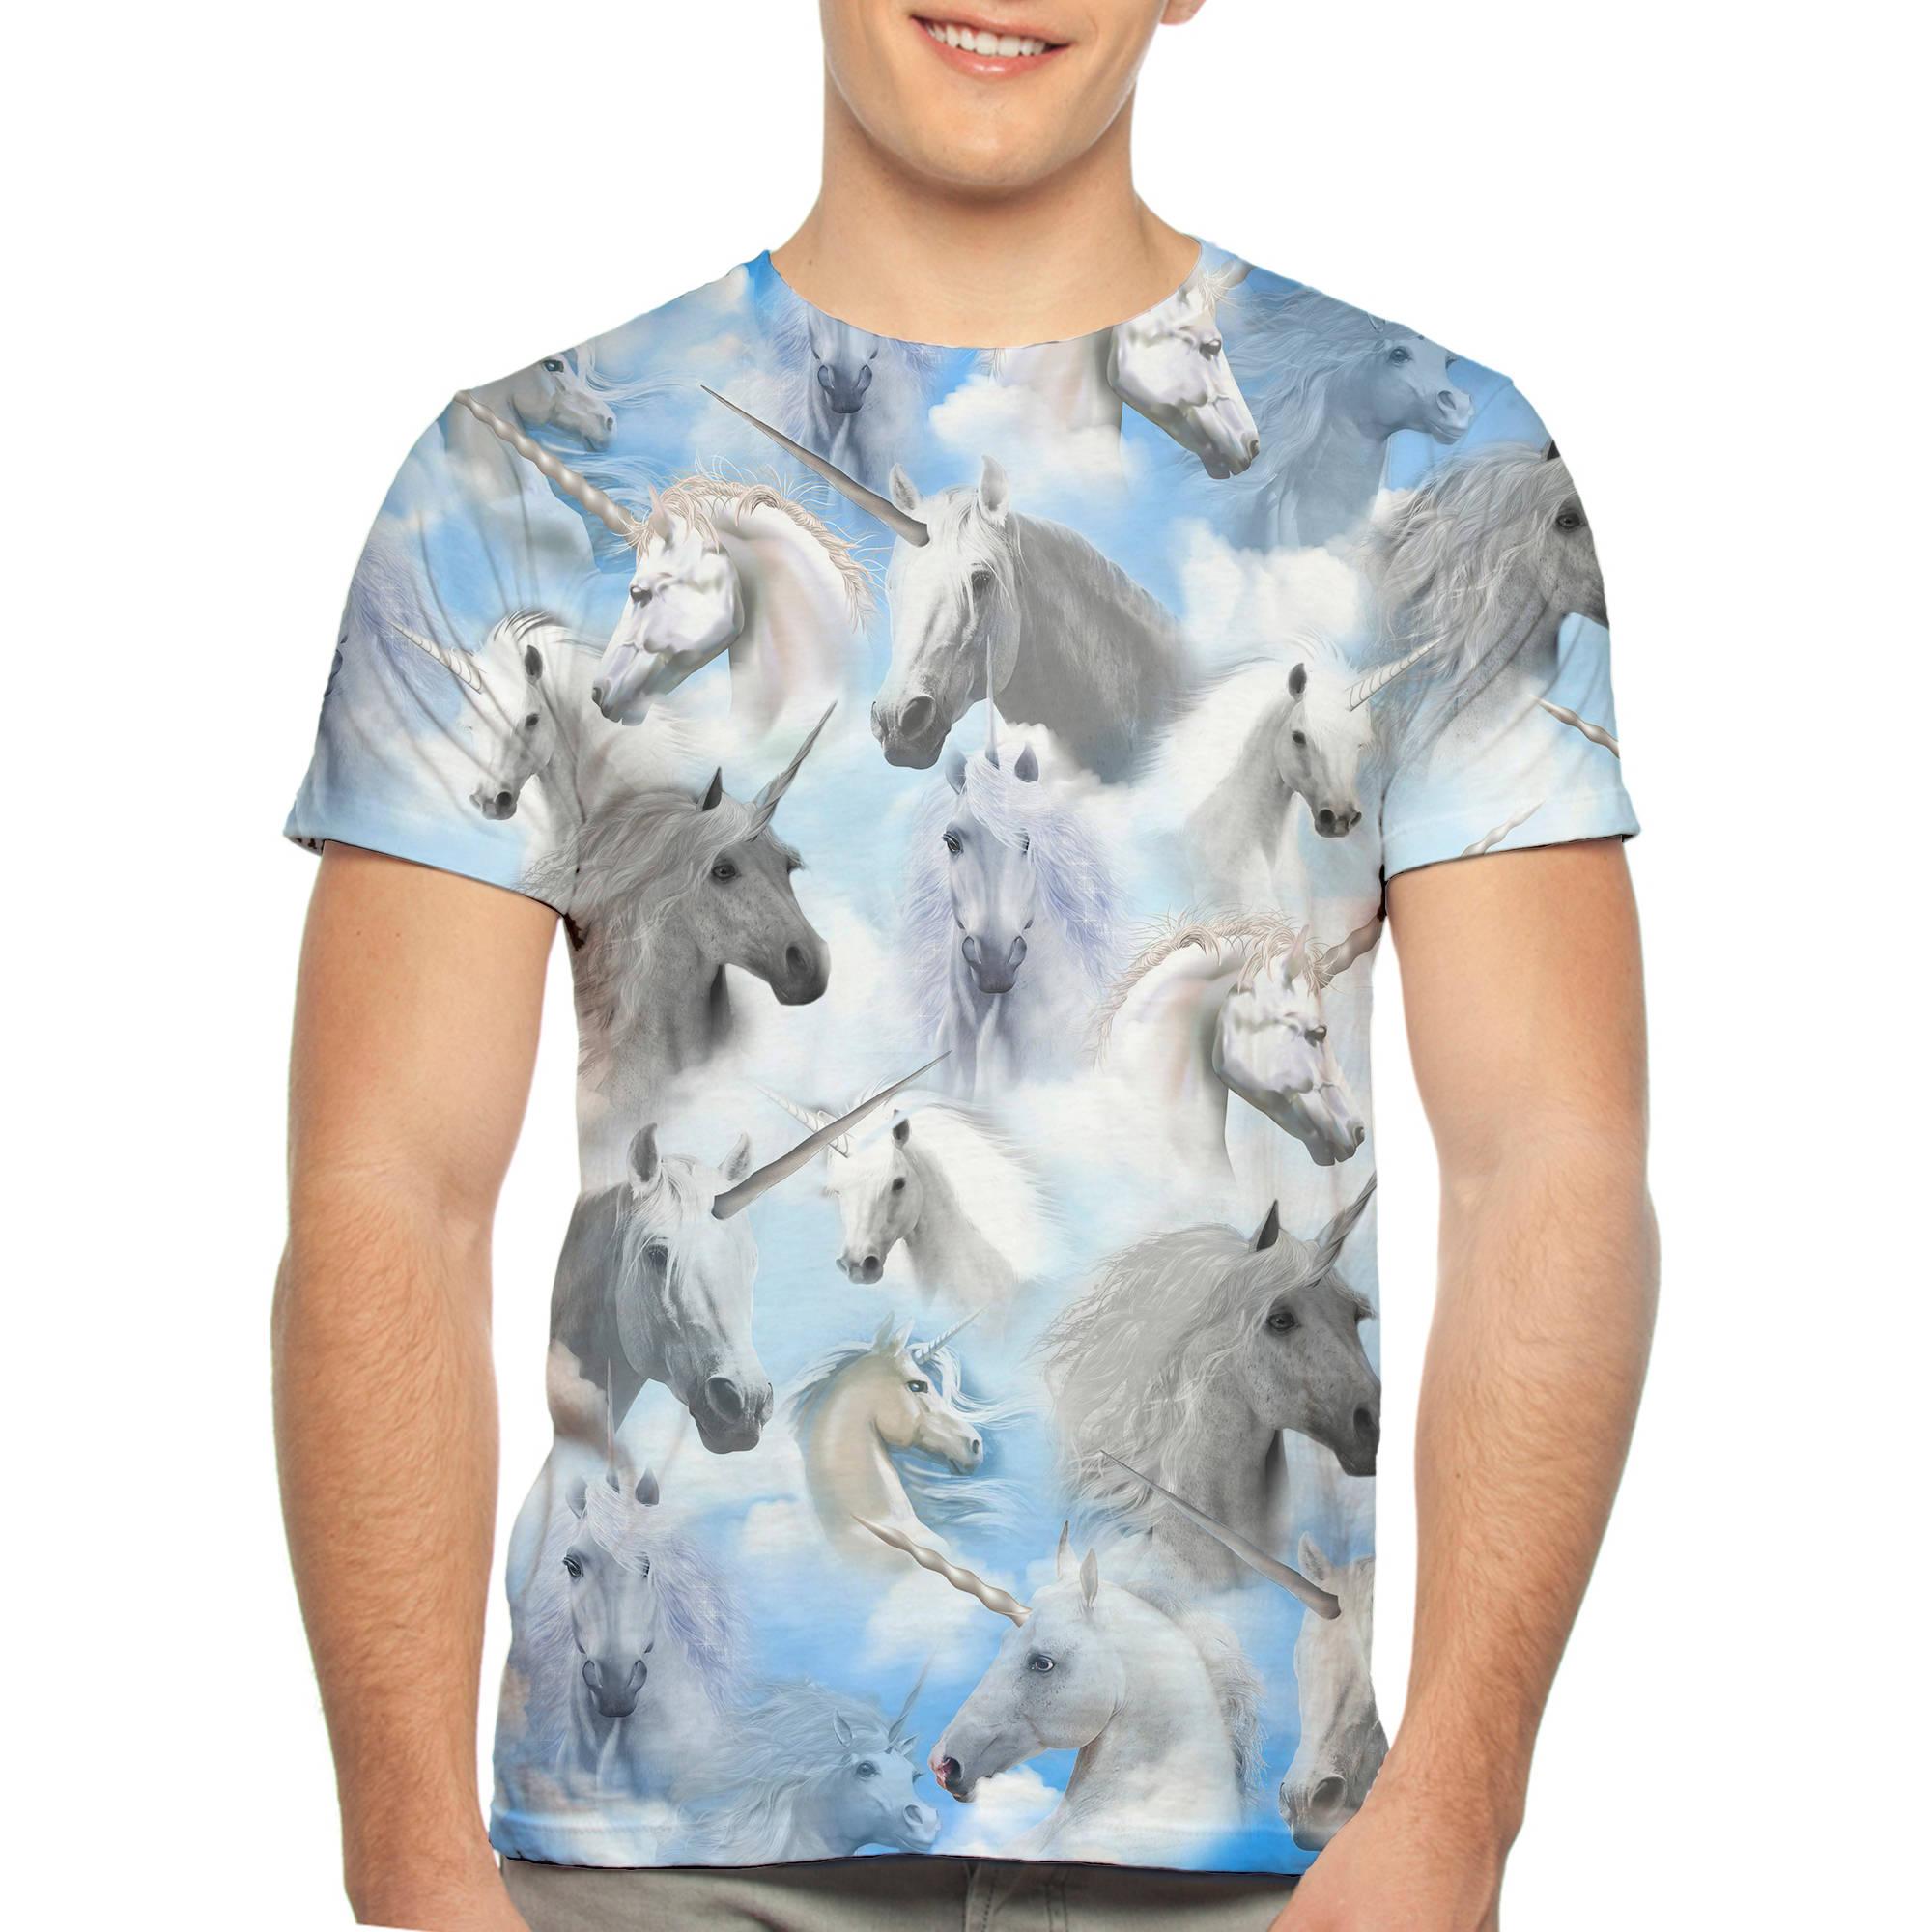 Unicorn All Over Print Big Men's Graphic Tee, 2XL